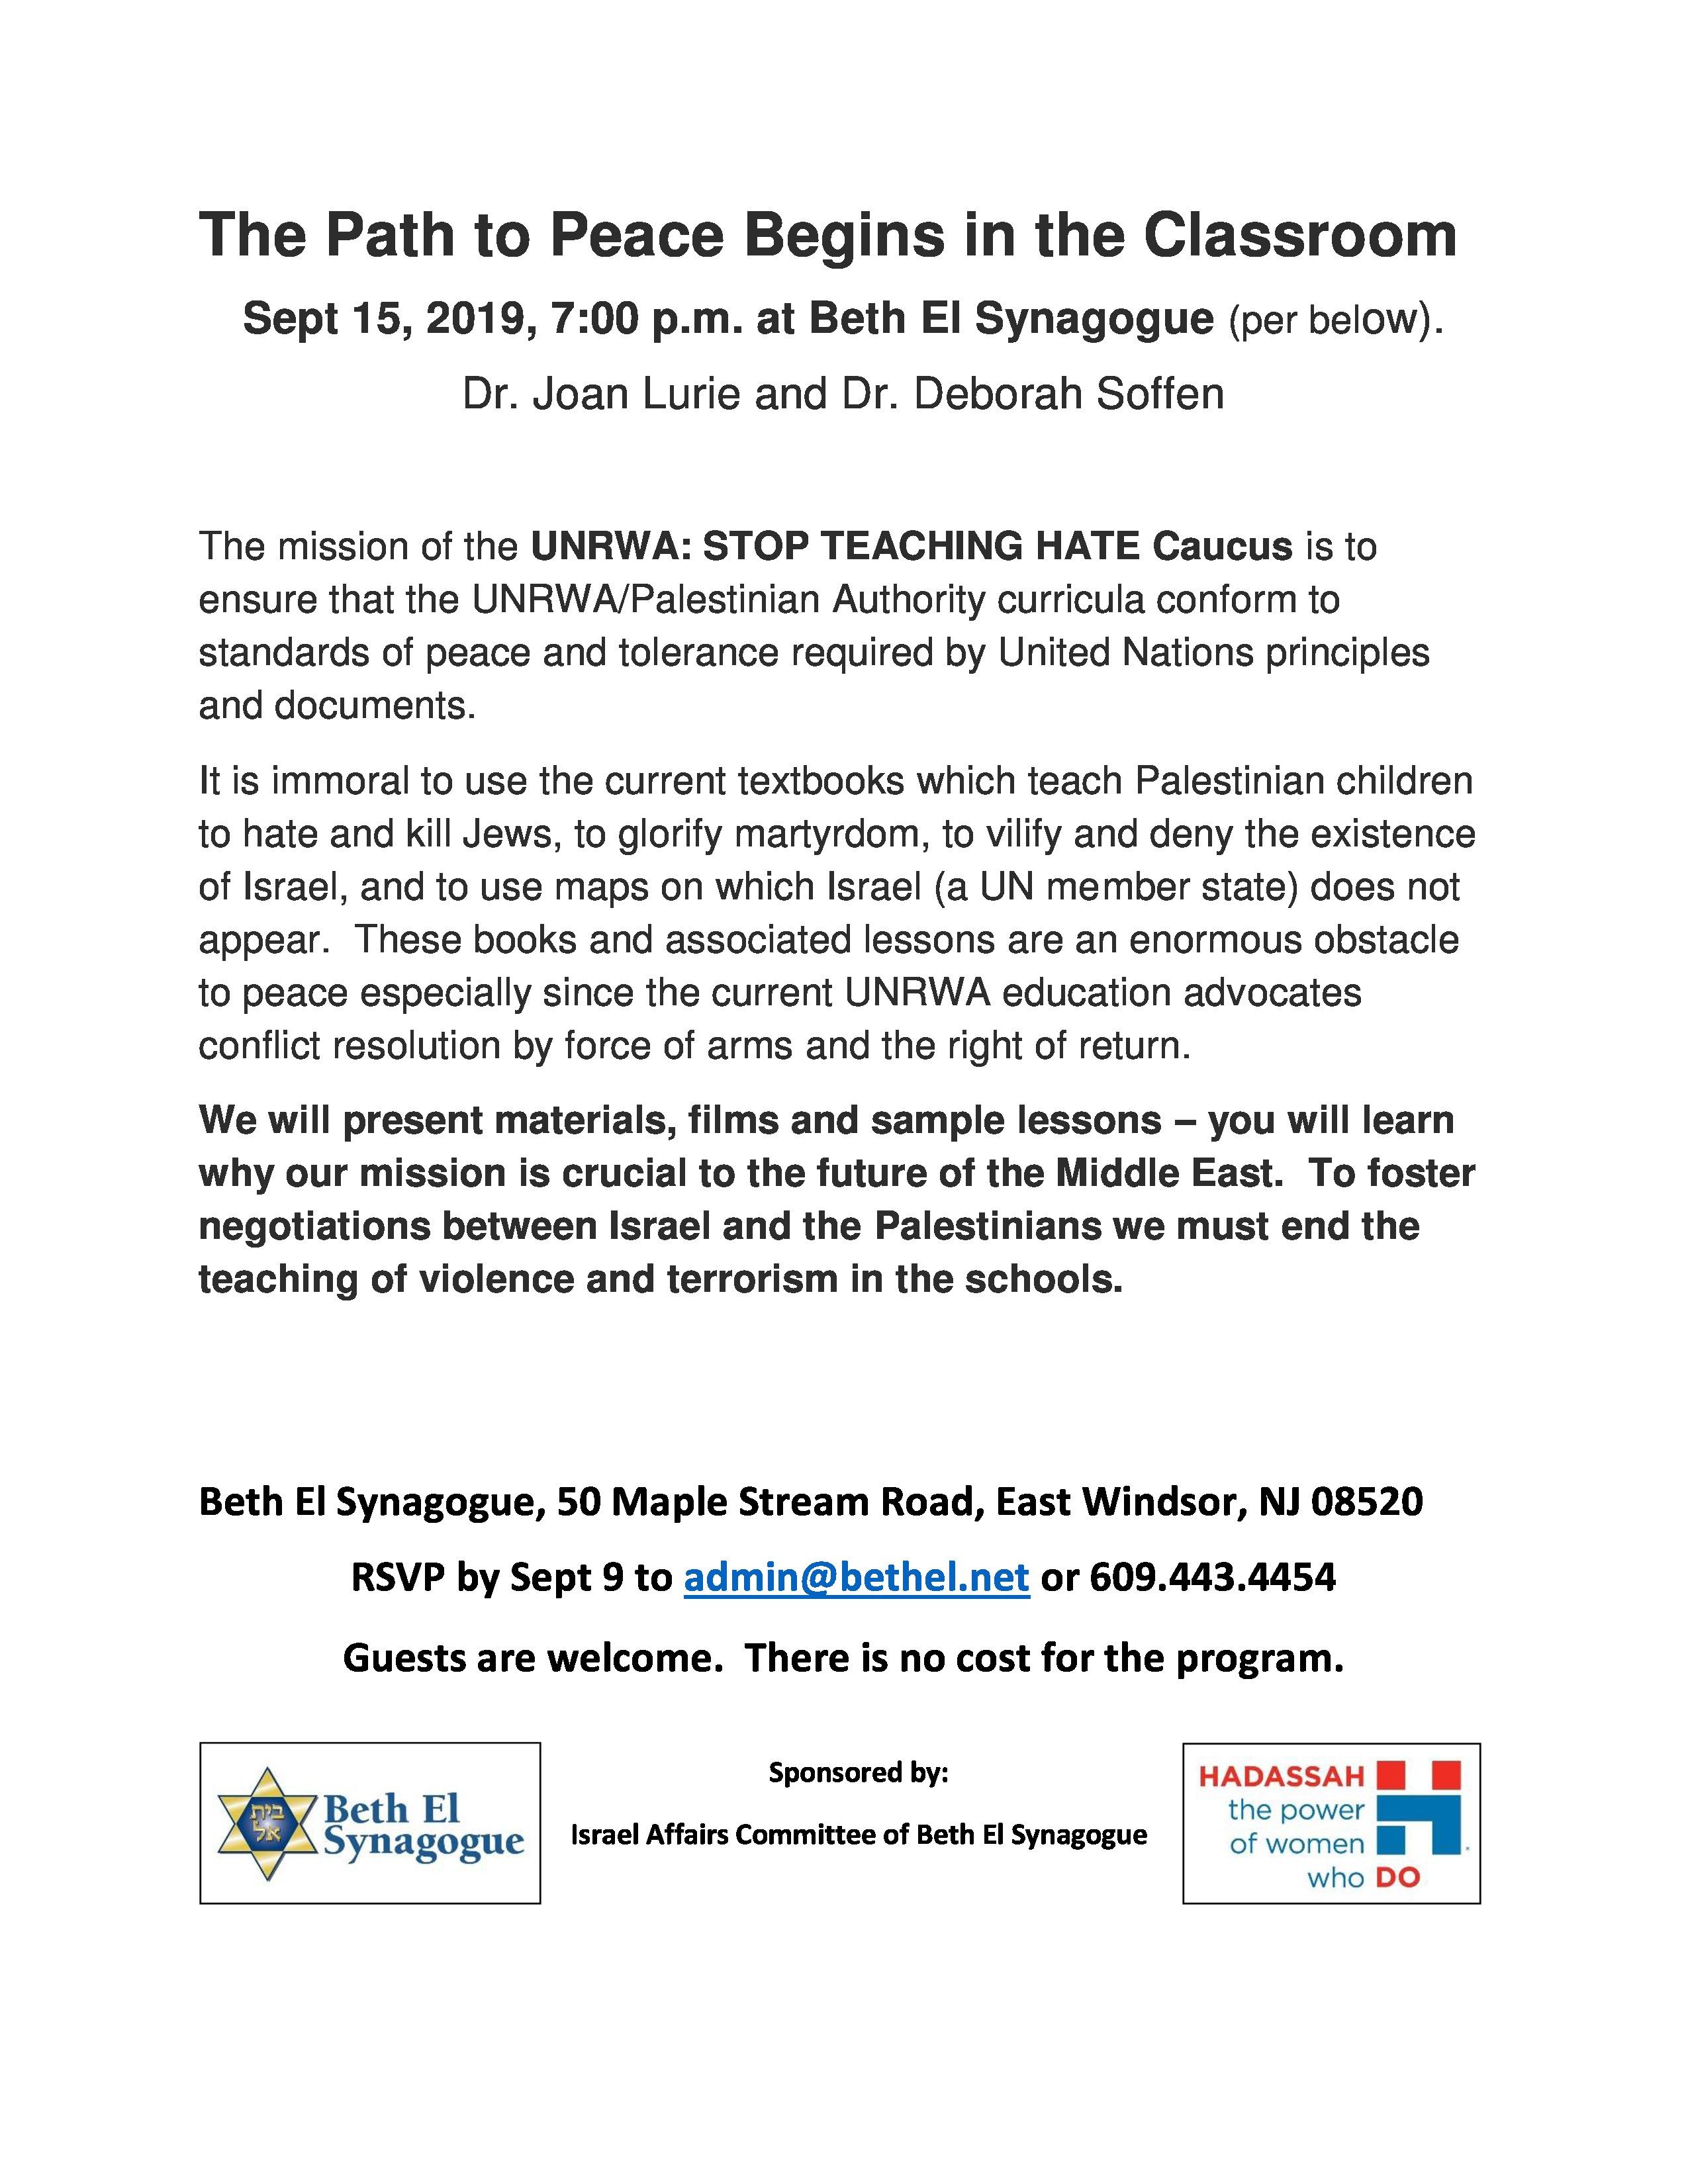 9.15.19-IAC.UNRWA-stop-teaching-hate-